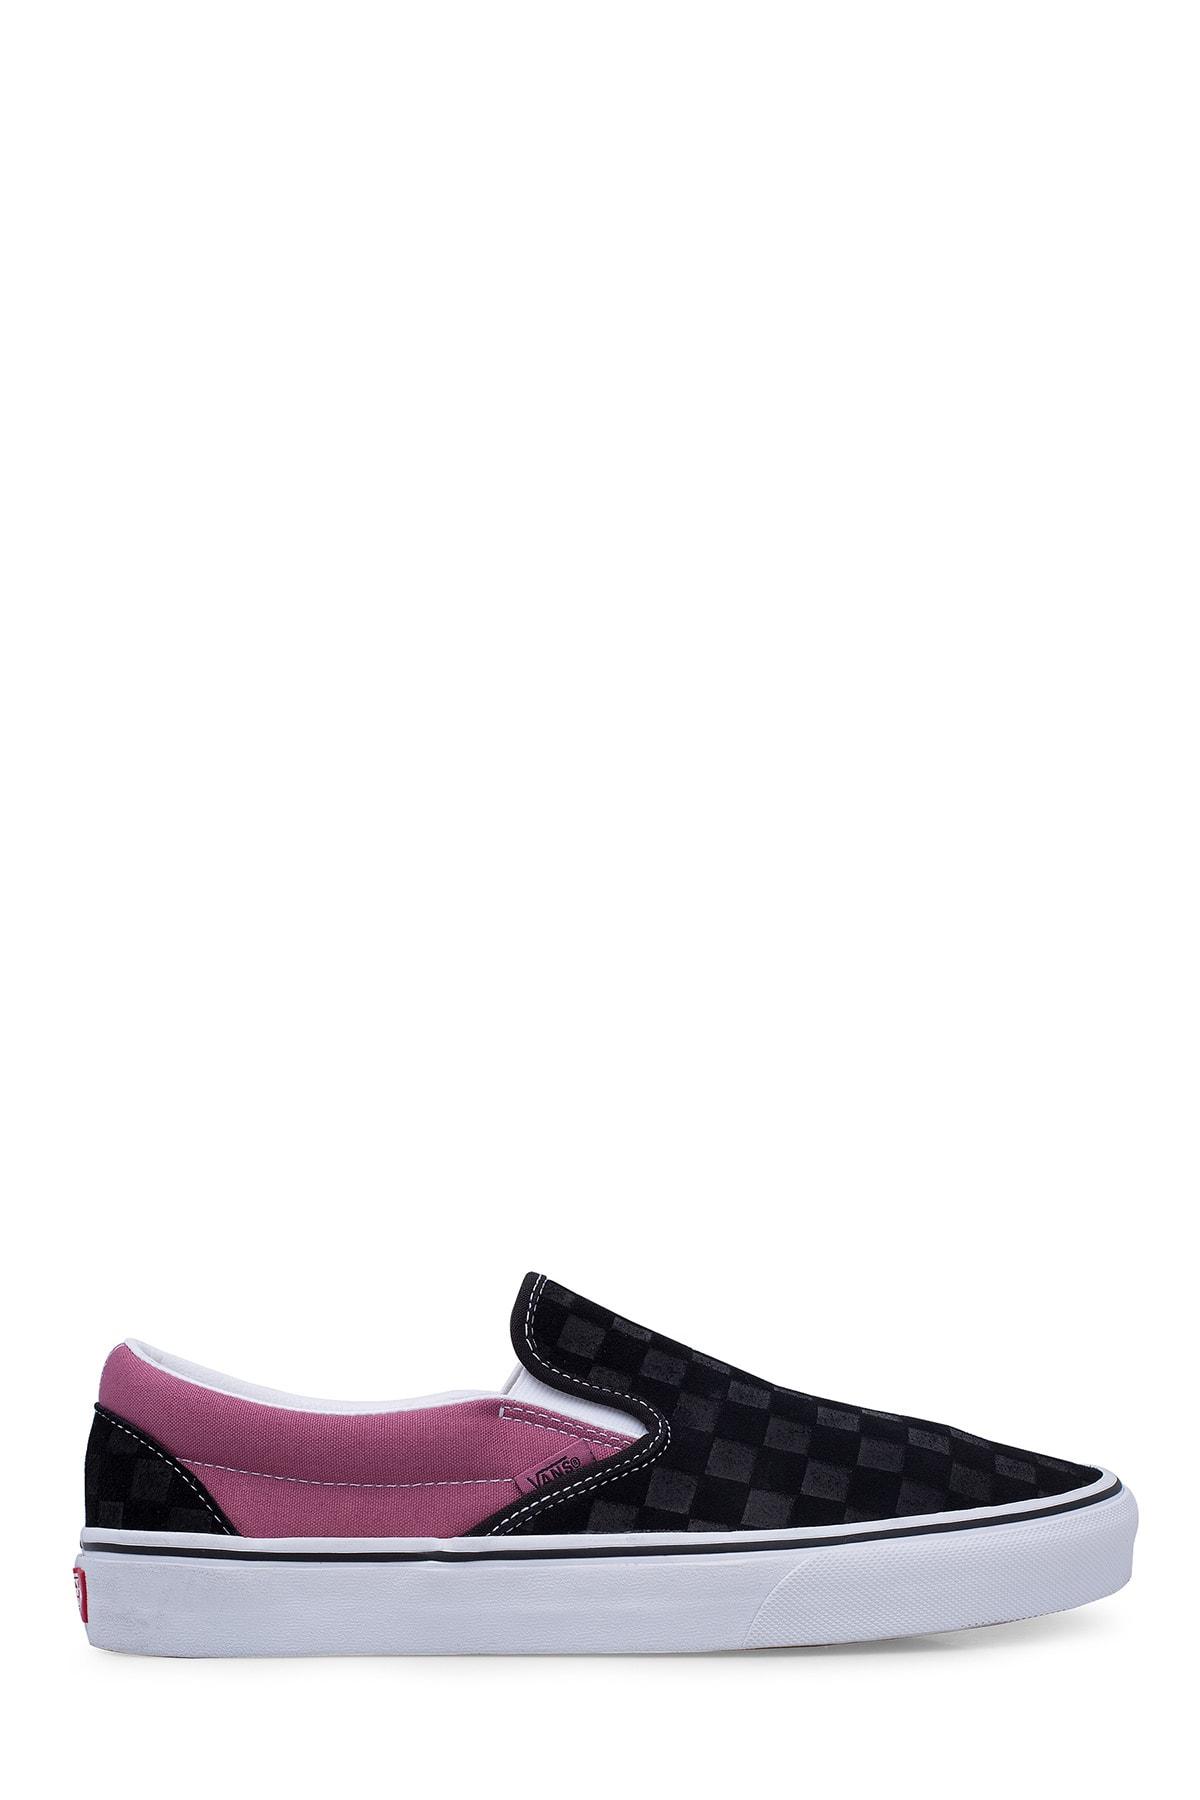 Vans UA CLASSIC SLIP-ON Siyah Erkek Slip On Ayakkabı 100583585 1